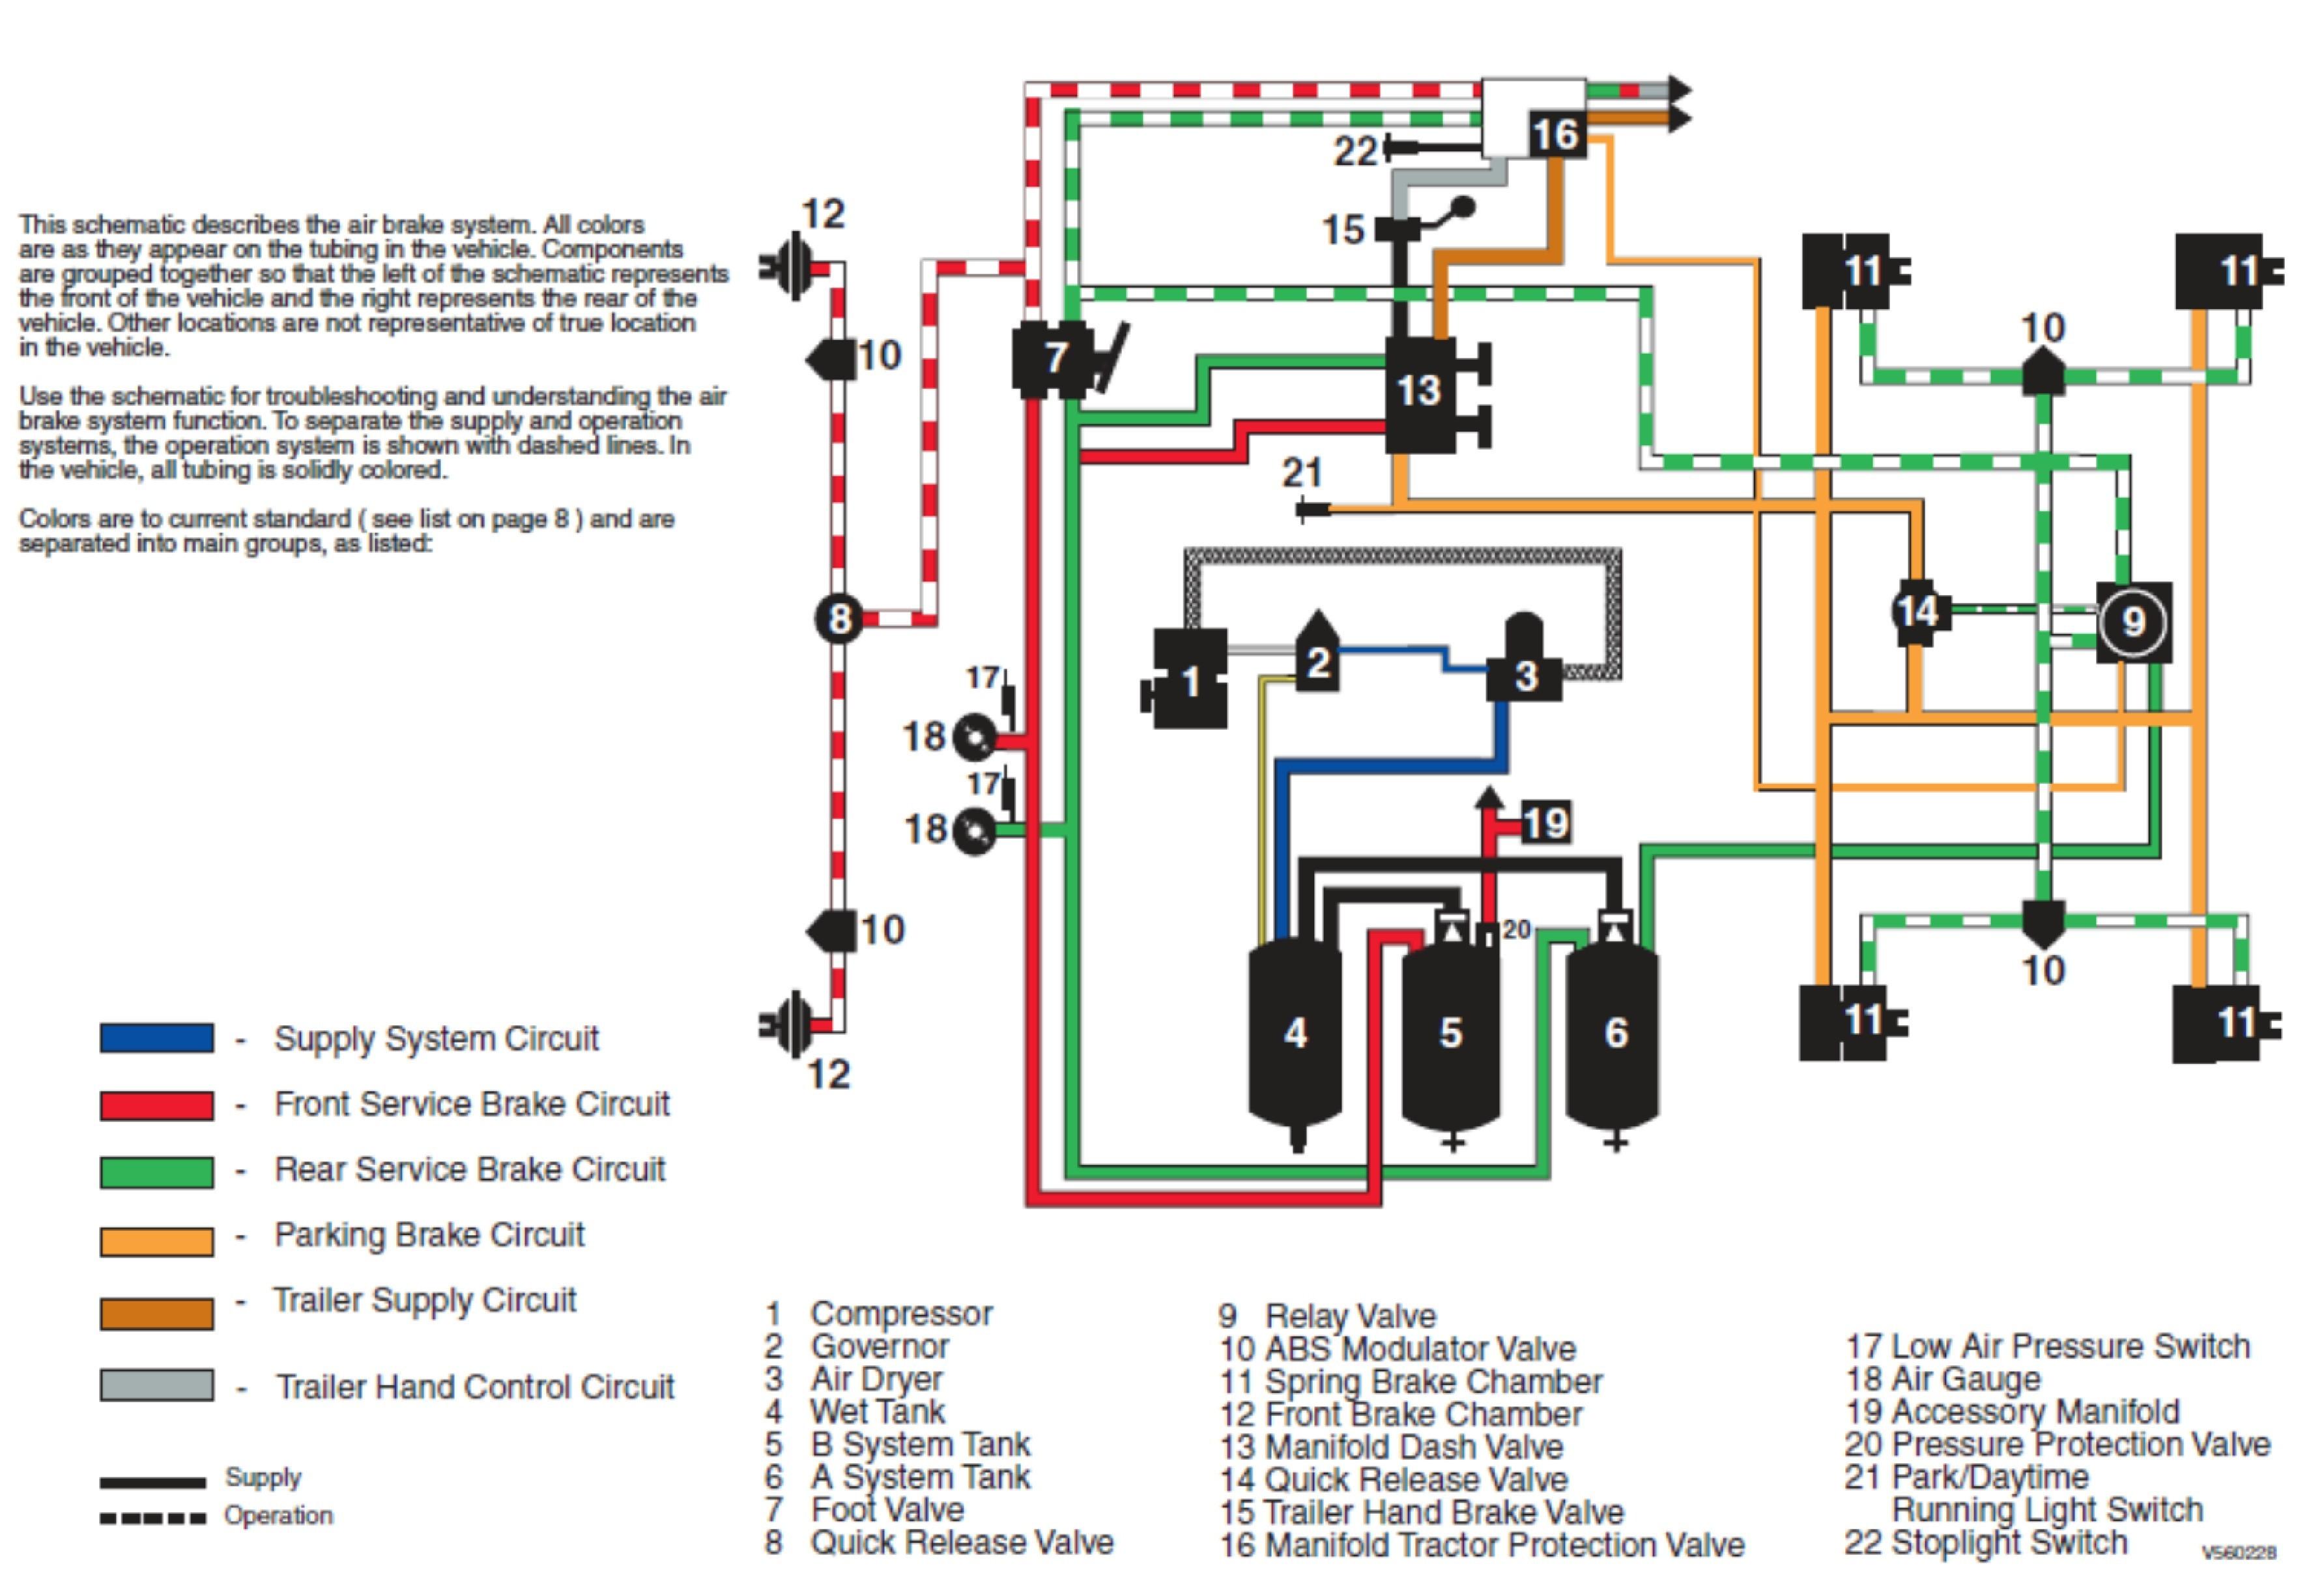 Automobile Brake System Diagram Hayes Brakesmart Maxbrake Controllers Of Automobile Brake System Diagram